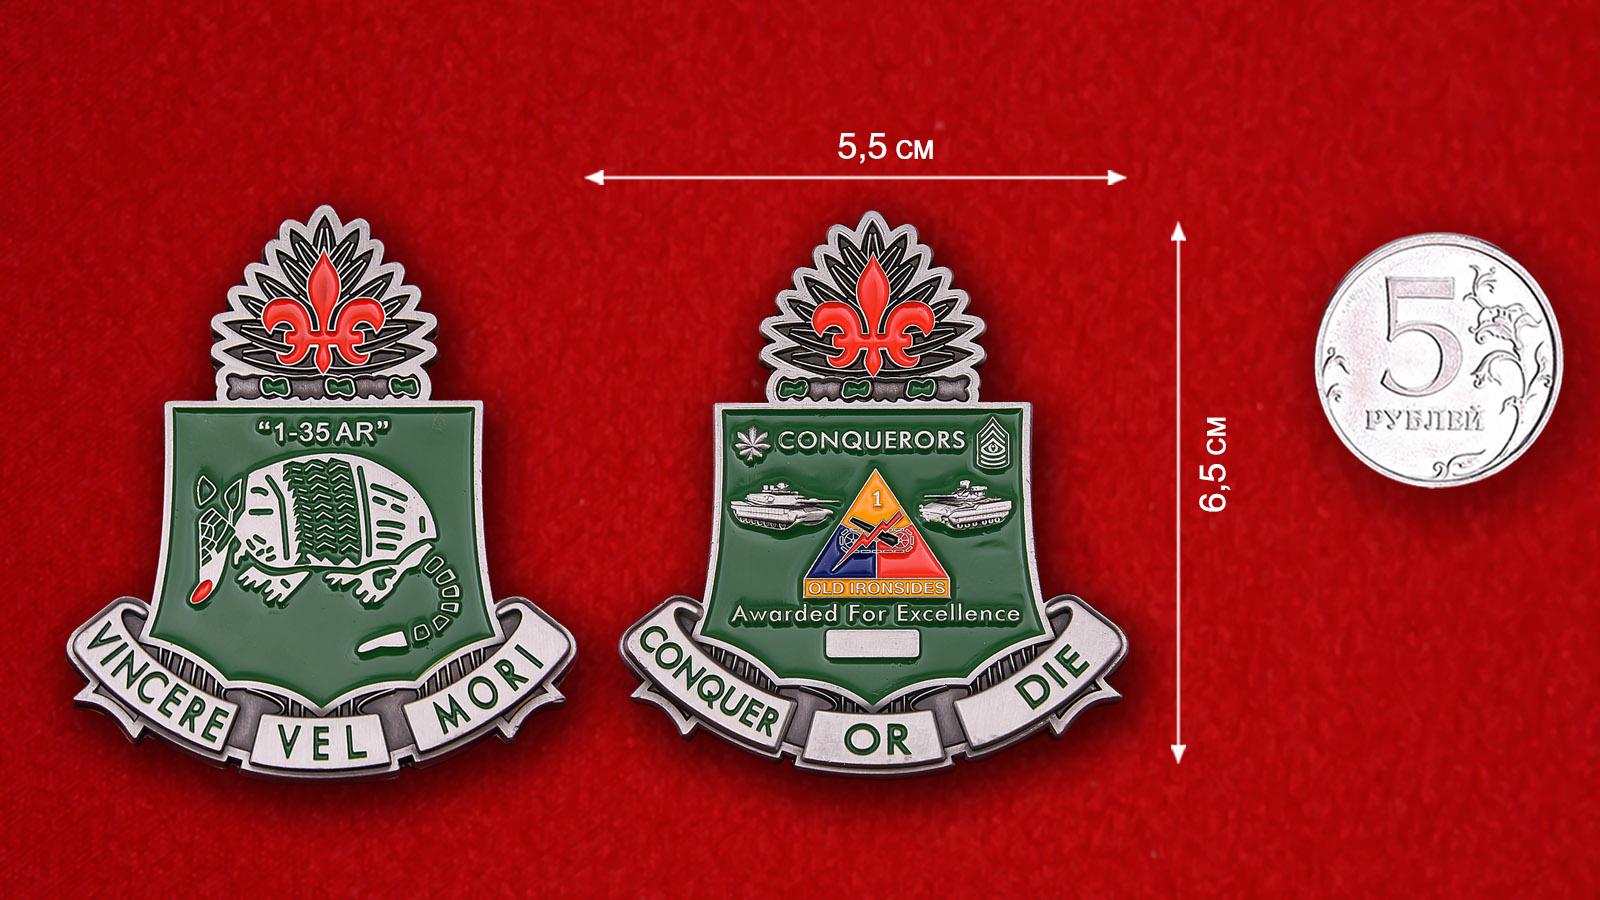 Челлендж коин 1-го батальона 35-го Танкового полка США